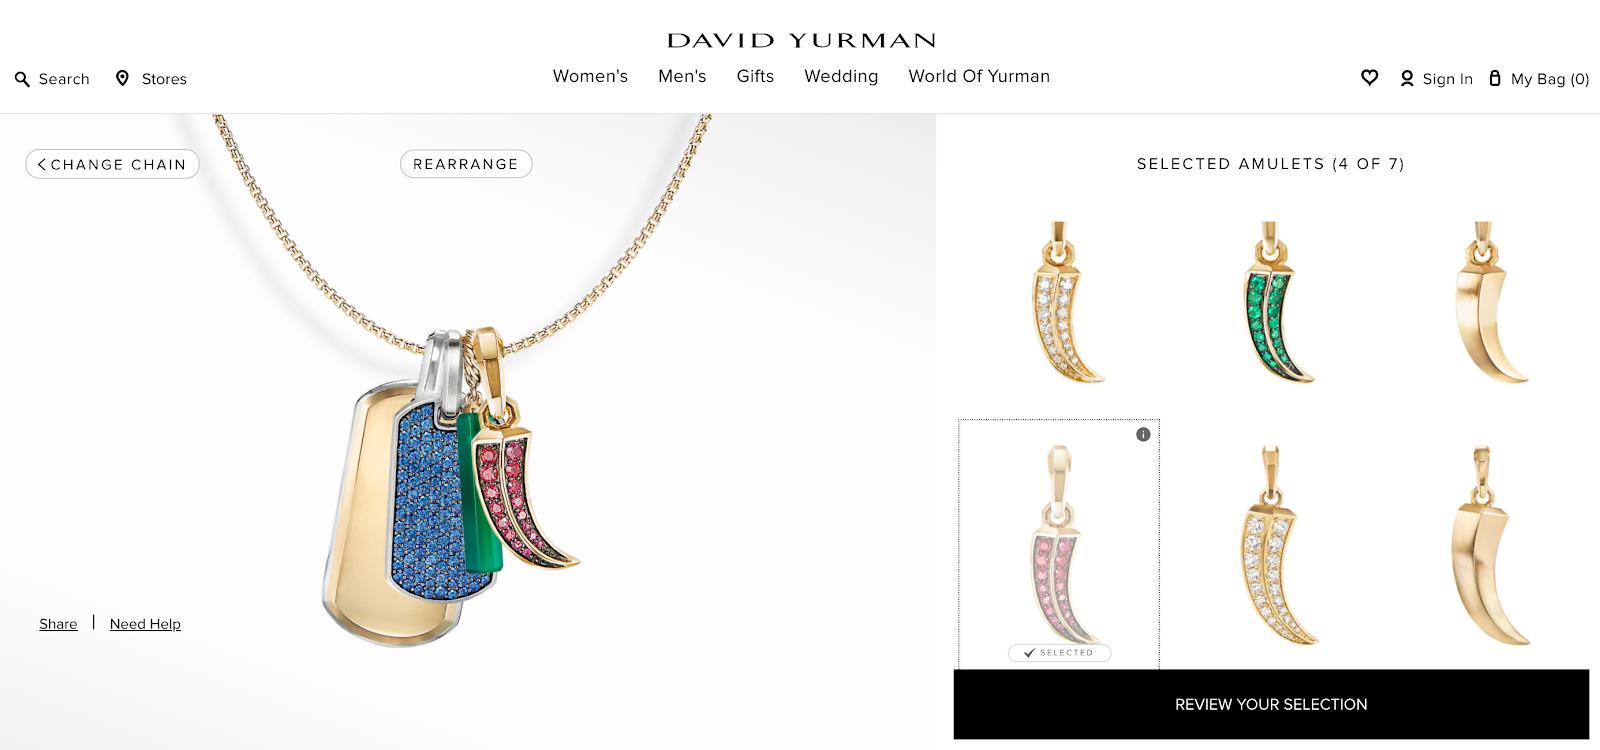 Online Interactive Configurators Are The Gold Standard For Jewelry E-commerce-1